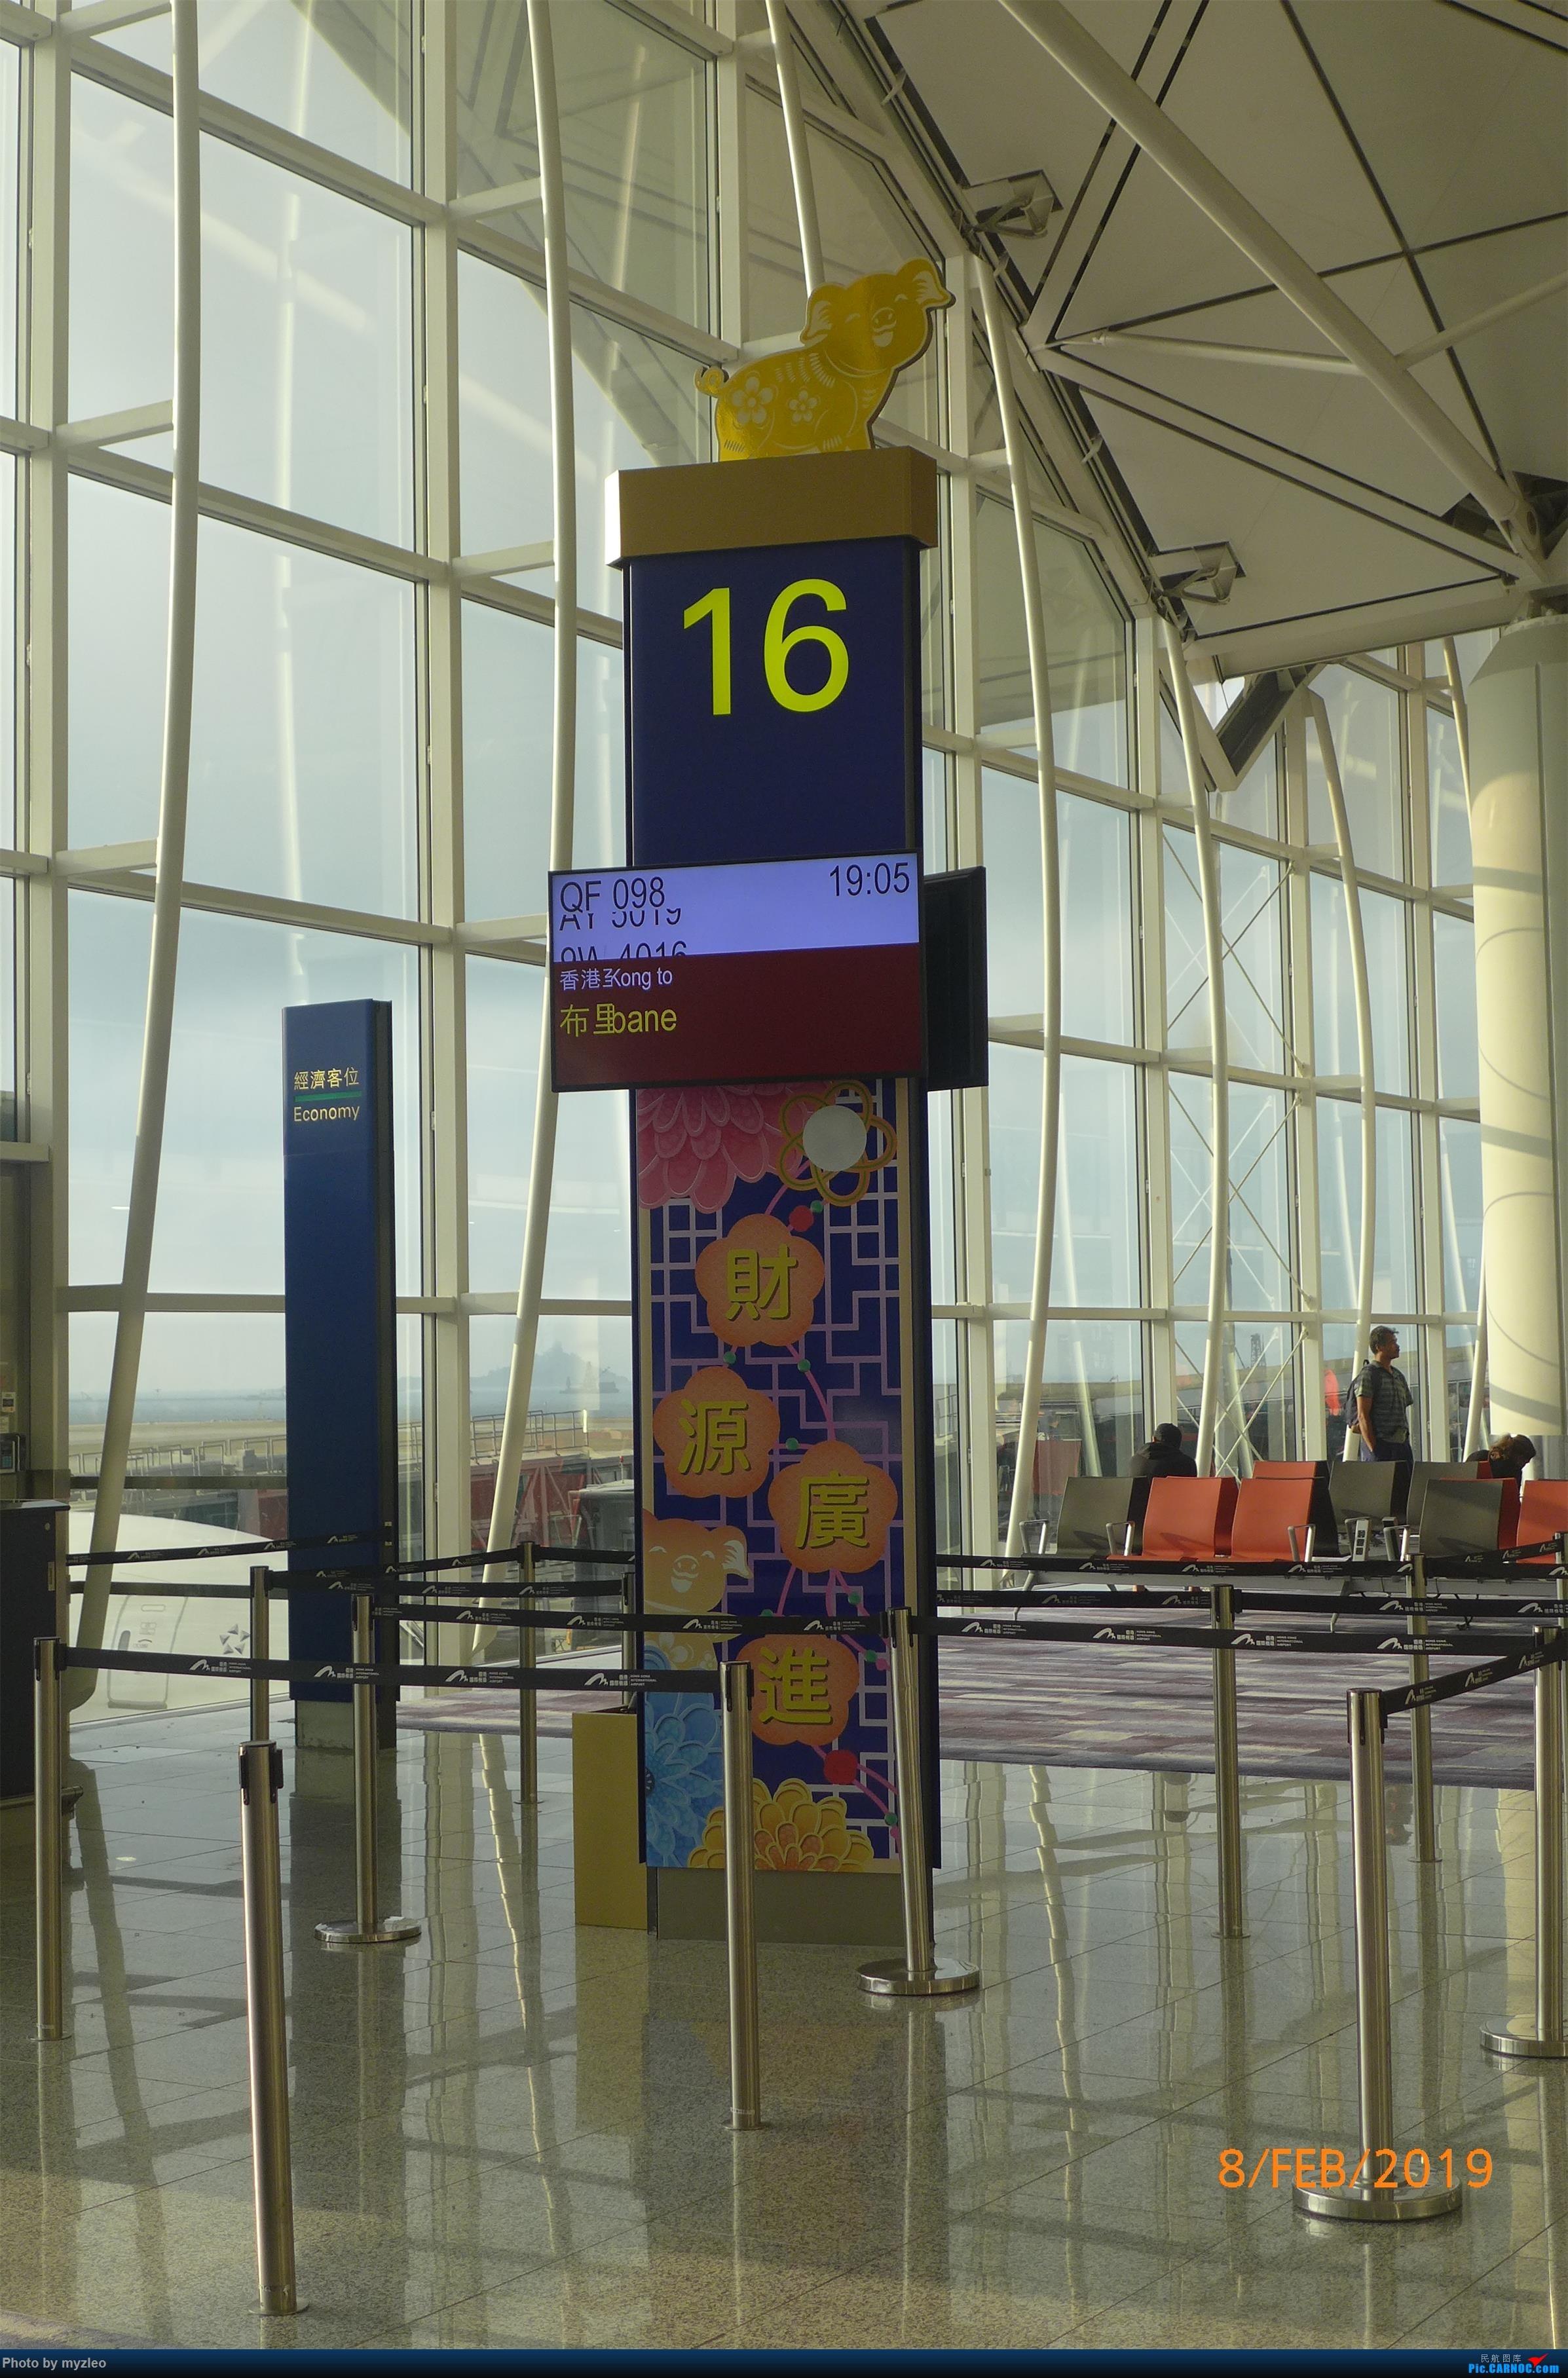 Re:[原创]【myzleo的游记4.5】十年之约(5)在香港的最后一天,搭乘港航333回沪 AIRBUS A330-300 B-HLE 中国香港国际机场 中国香港国际机场